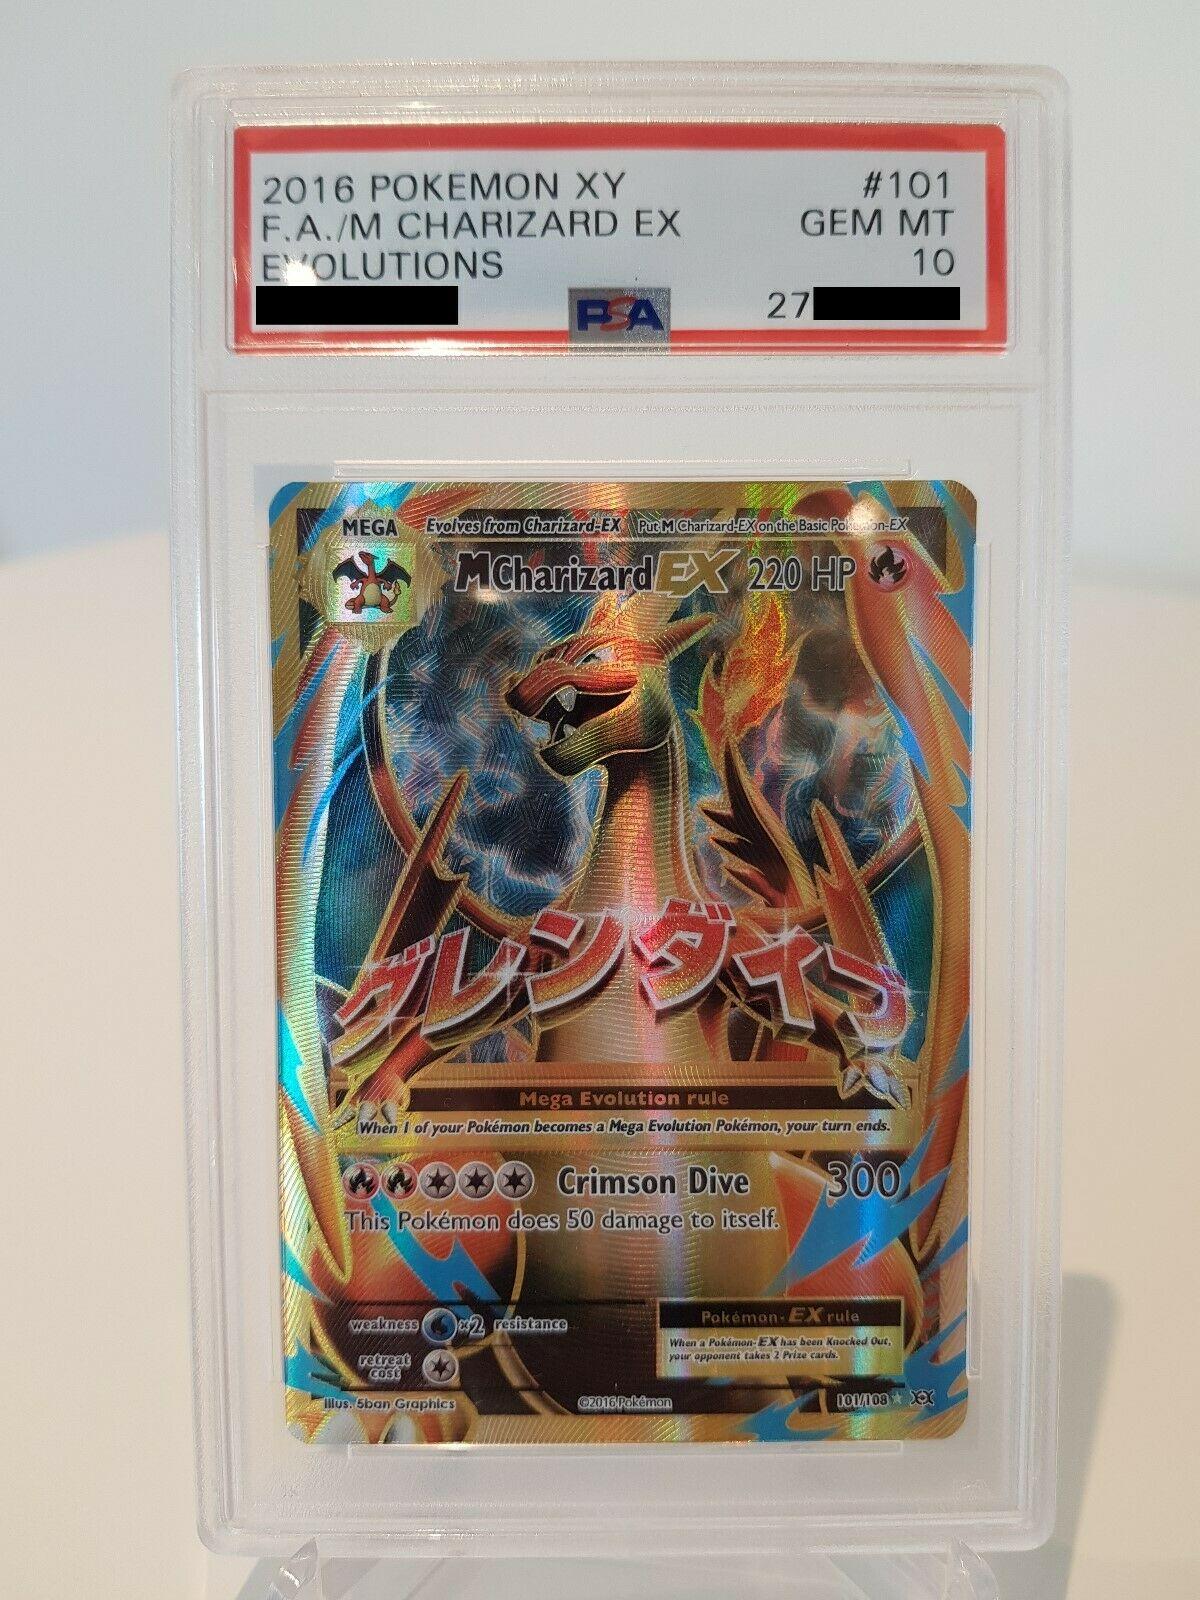 Pokemon Karte M Glurak EX PSA 10 Gem Mint Evolution XY12 101108 Charizard